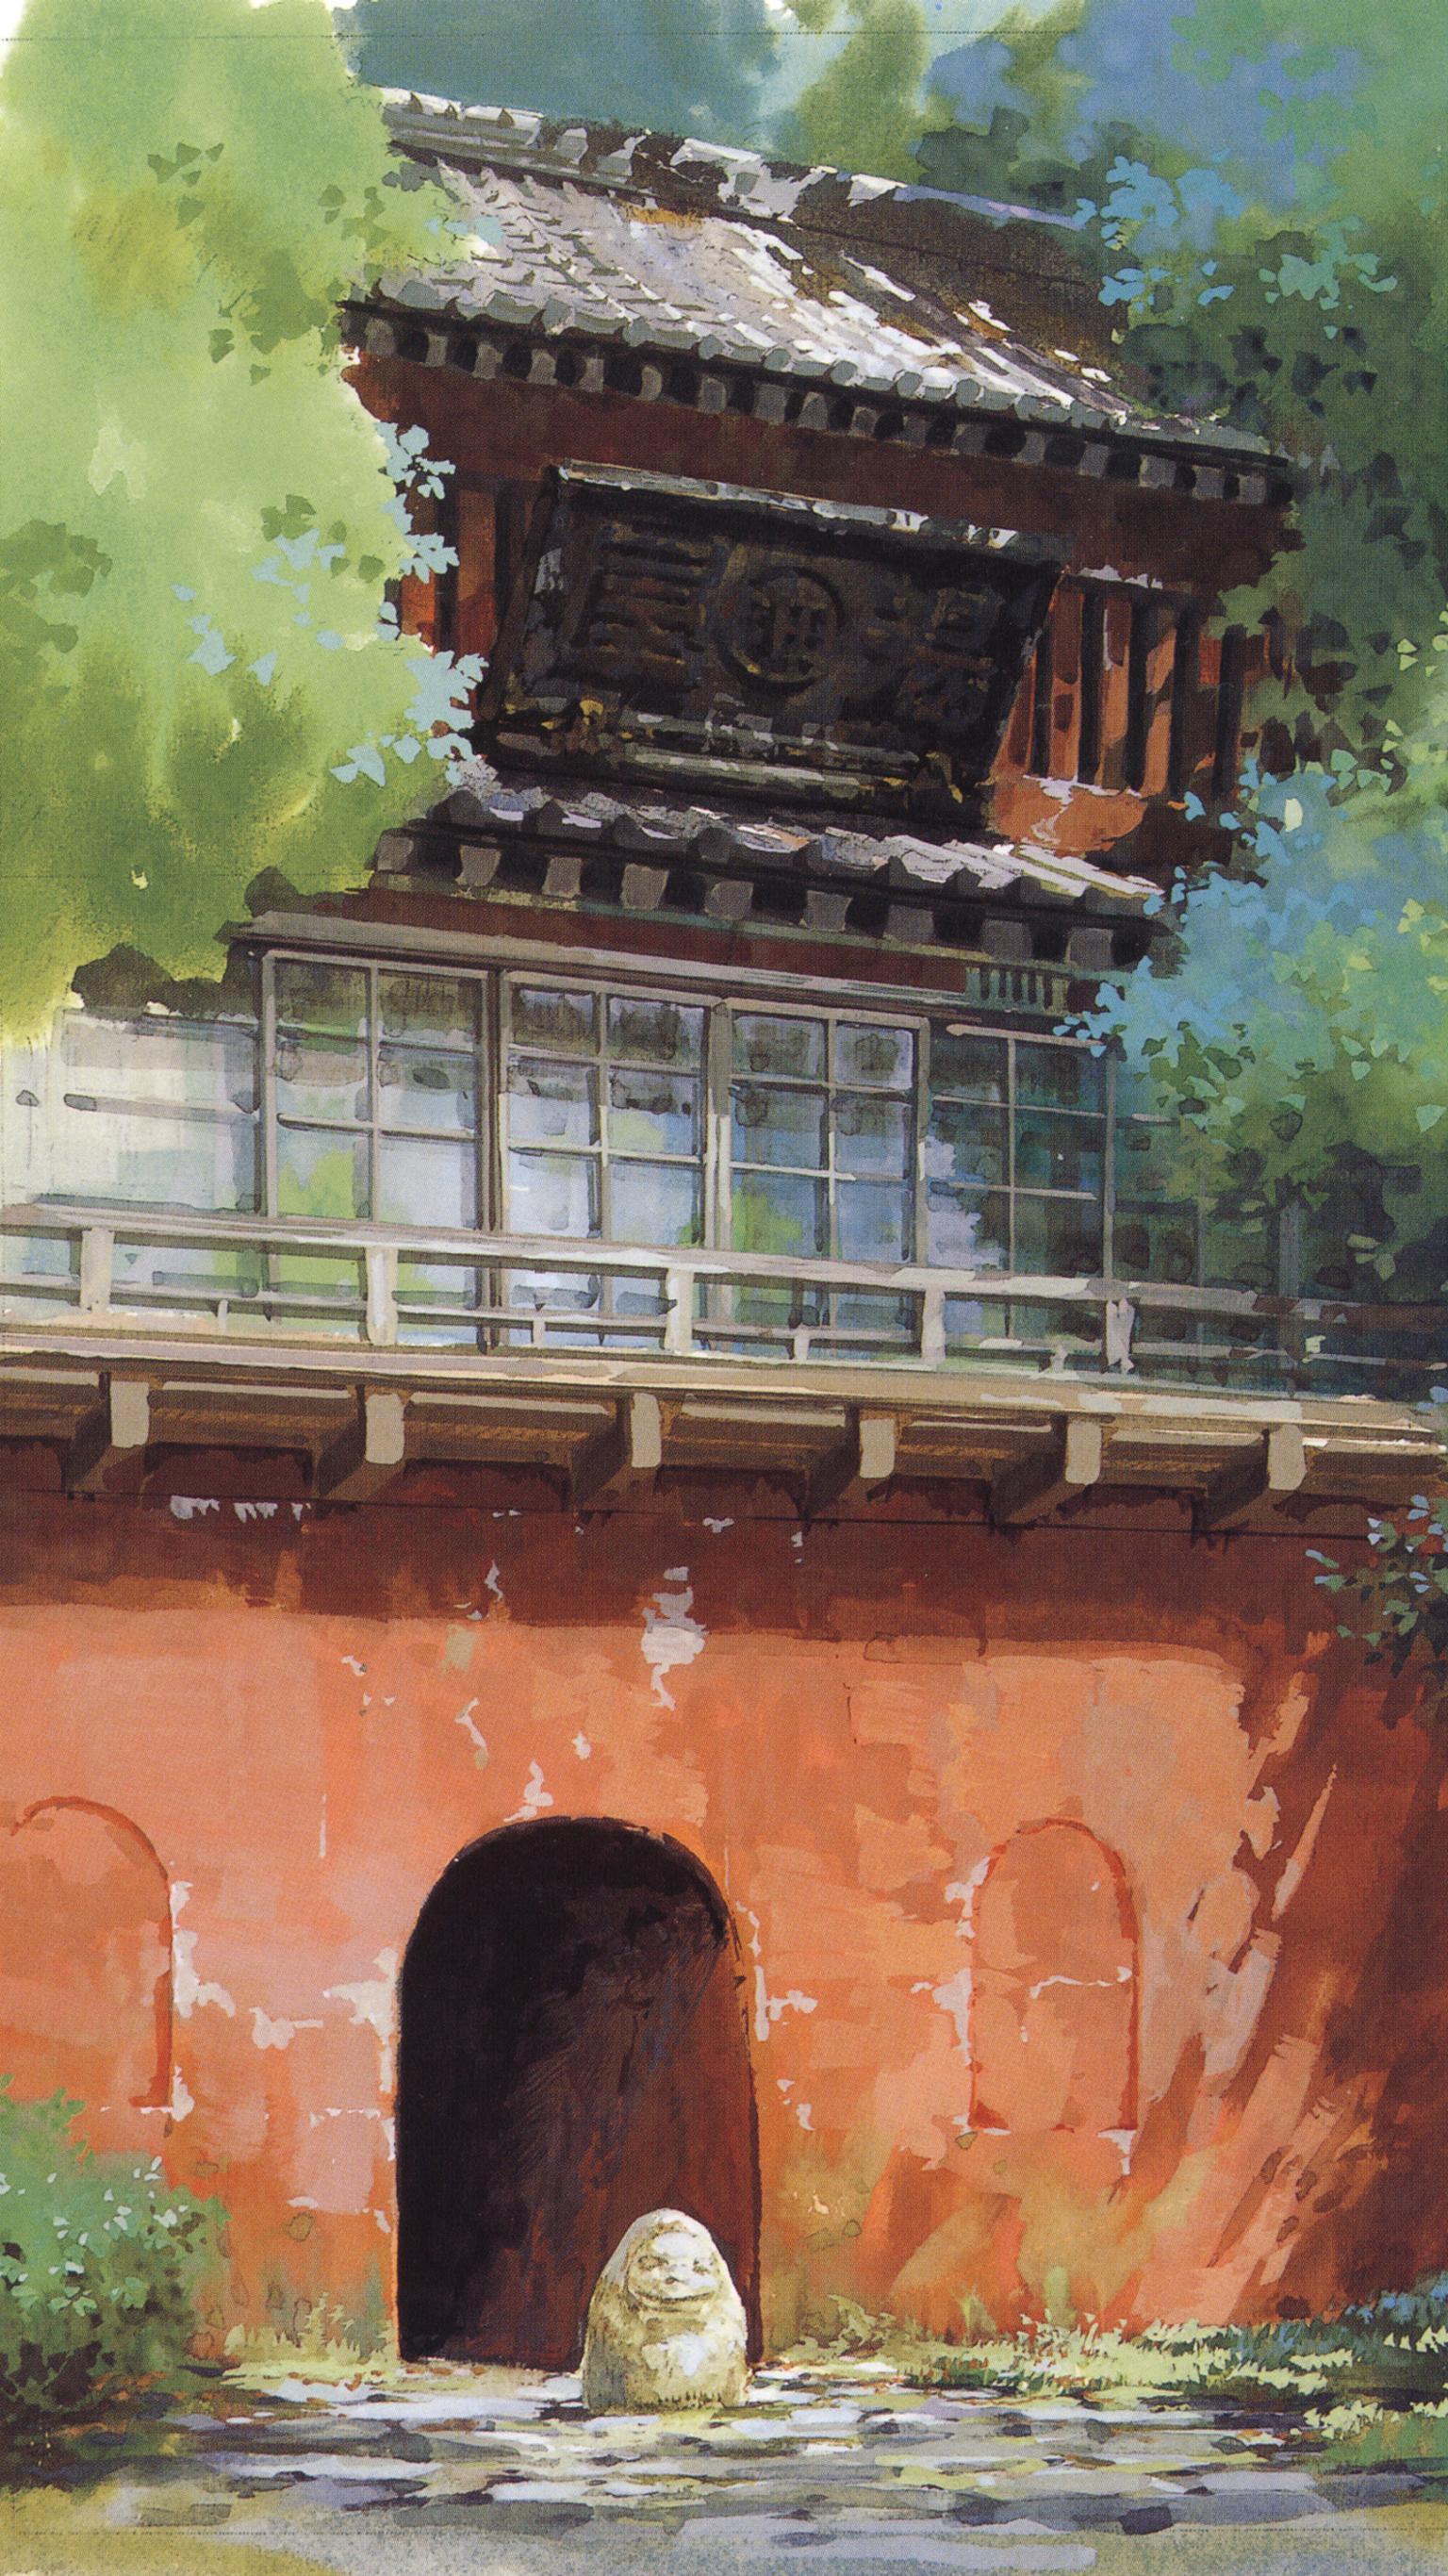 Spirited Away Mobile Wallpapers Top Free Spirited Away Mobile Backgrounds Wallpaperaccess